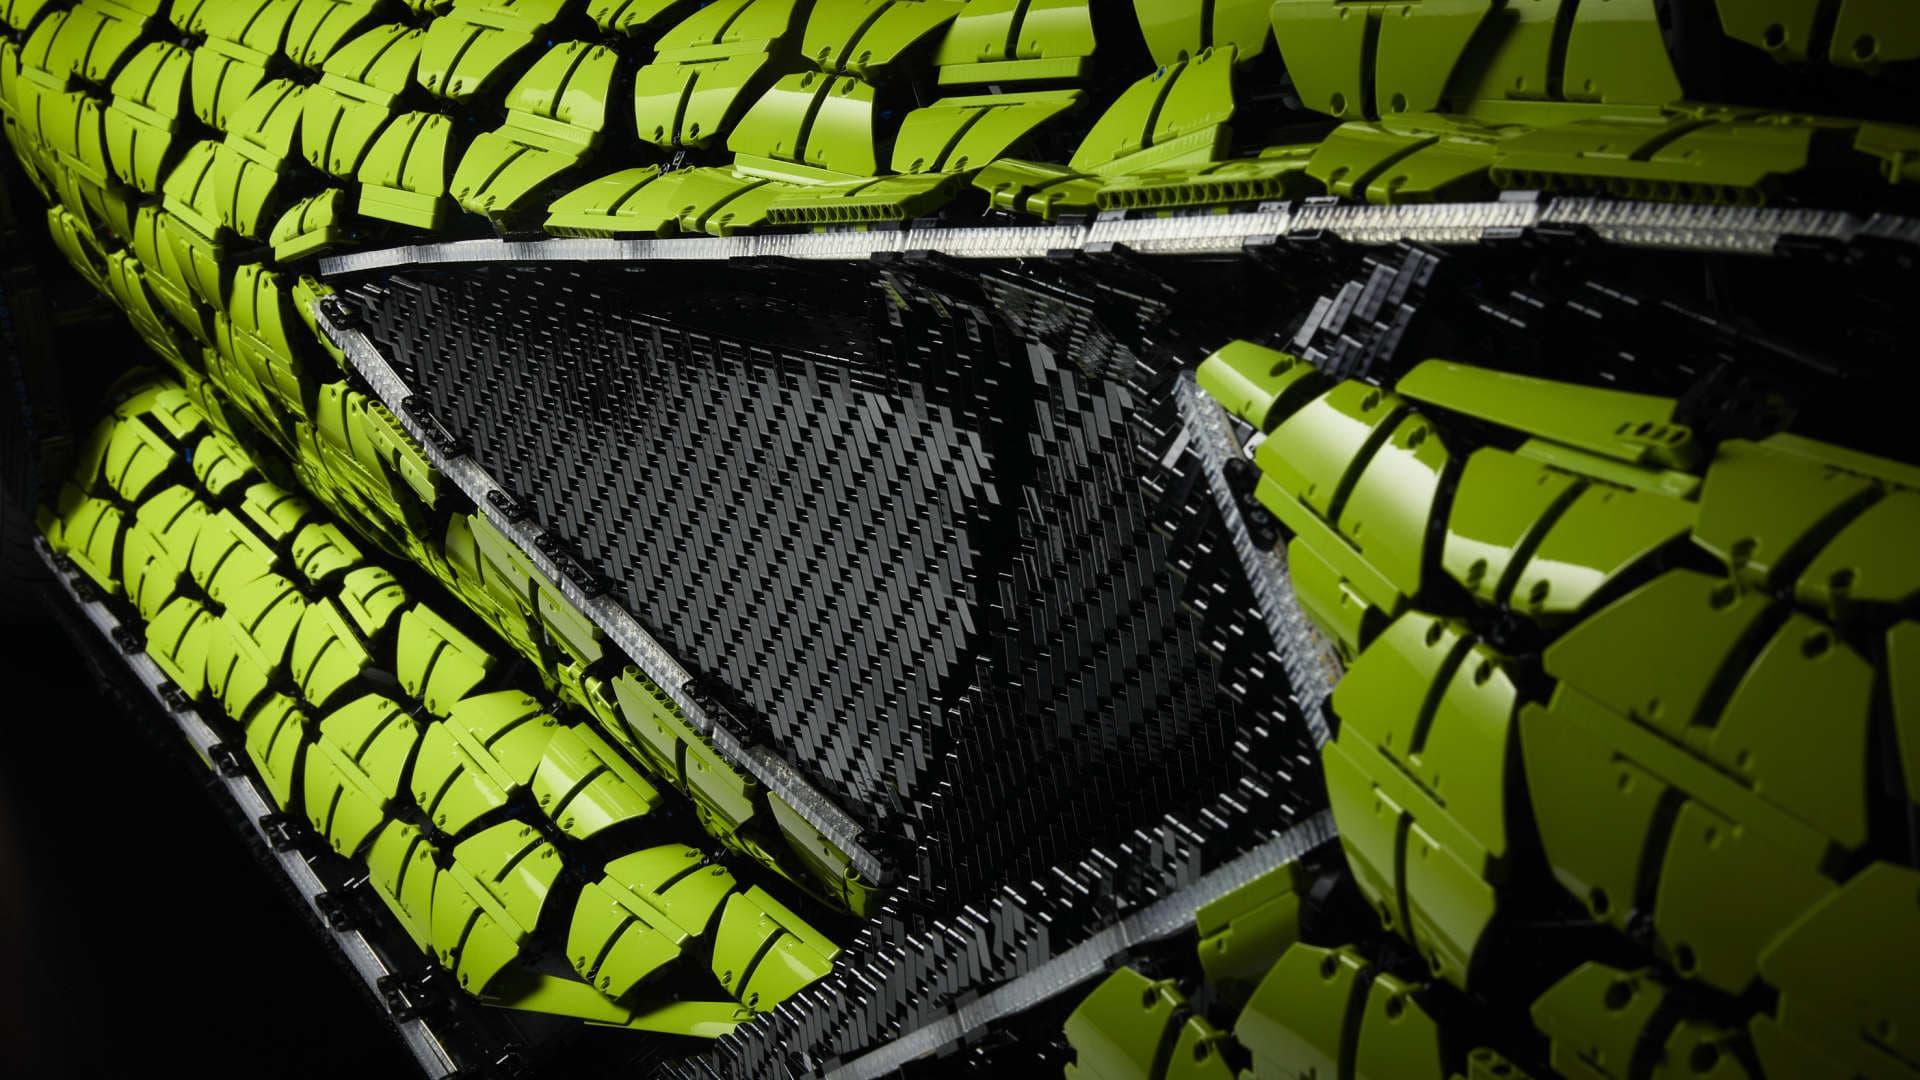 Lego Lamborghini Sian Tamano Real 32